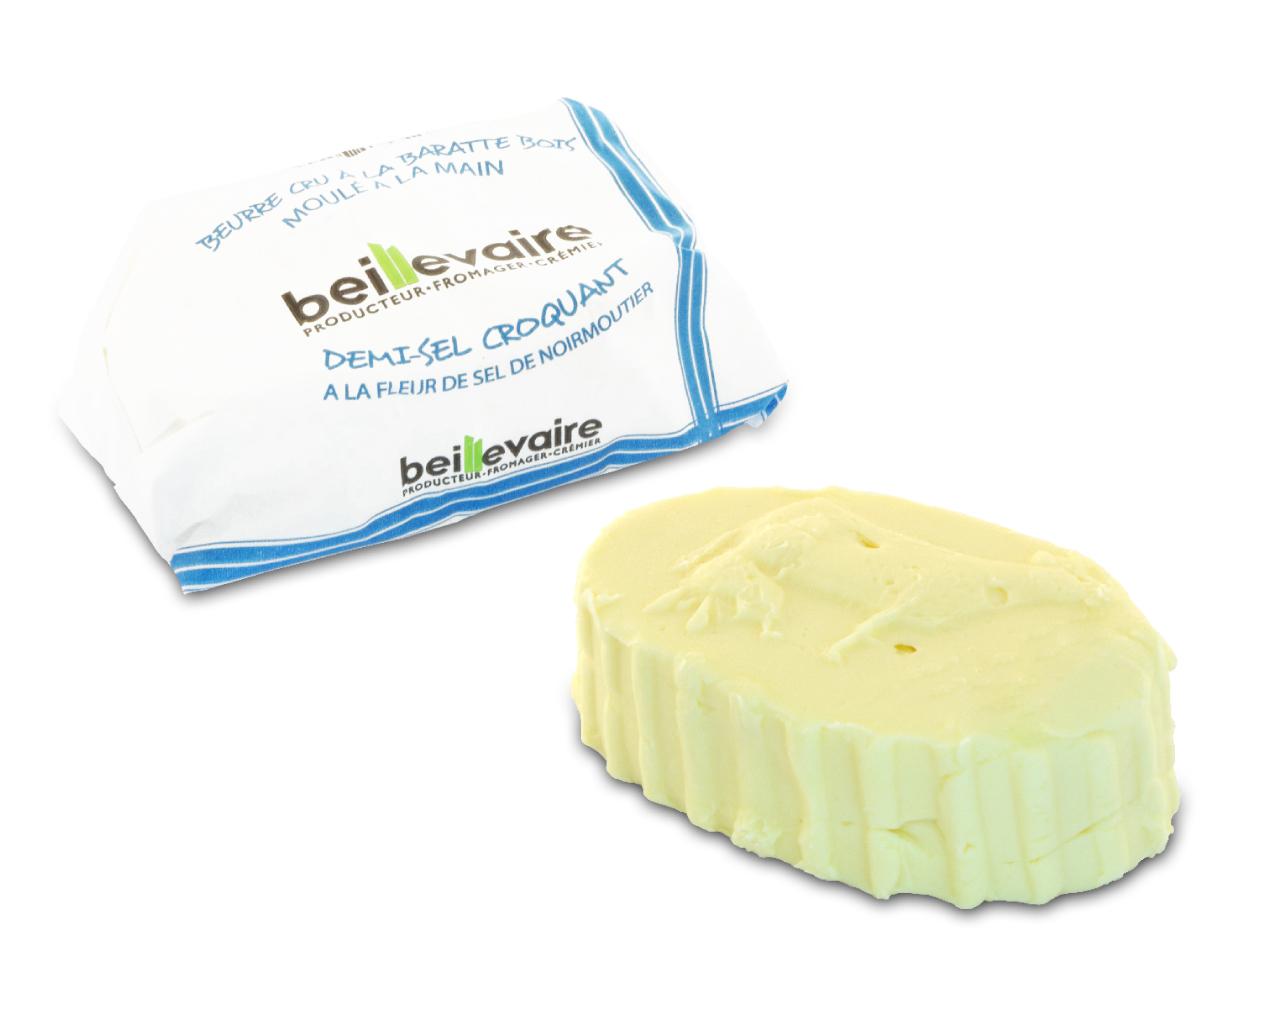 Beurre artisanal cru croquant, Beillevaire (125 g)